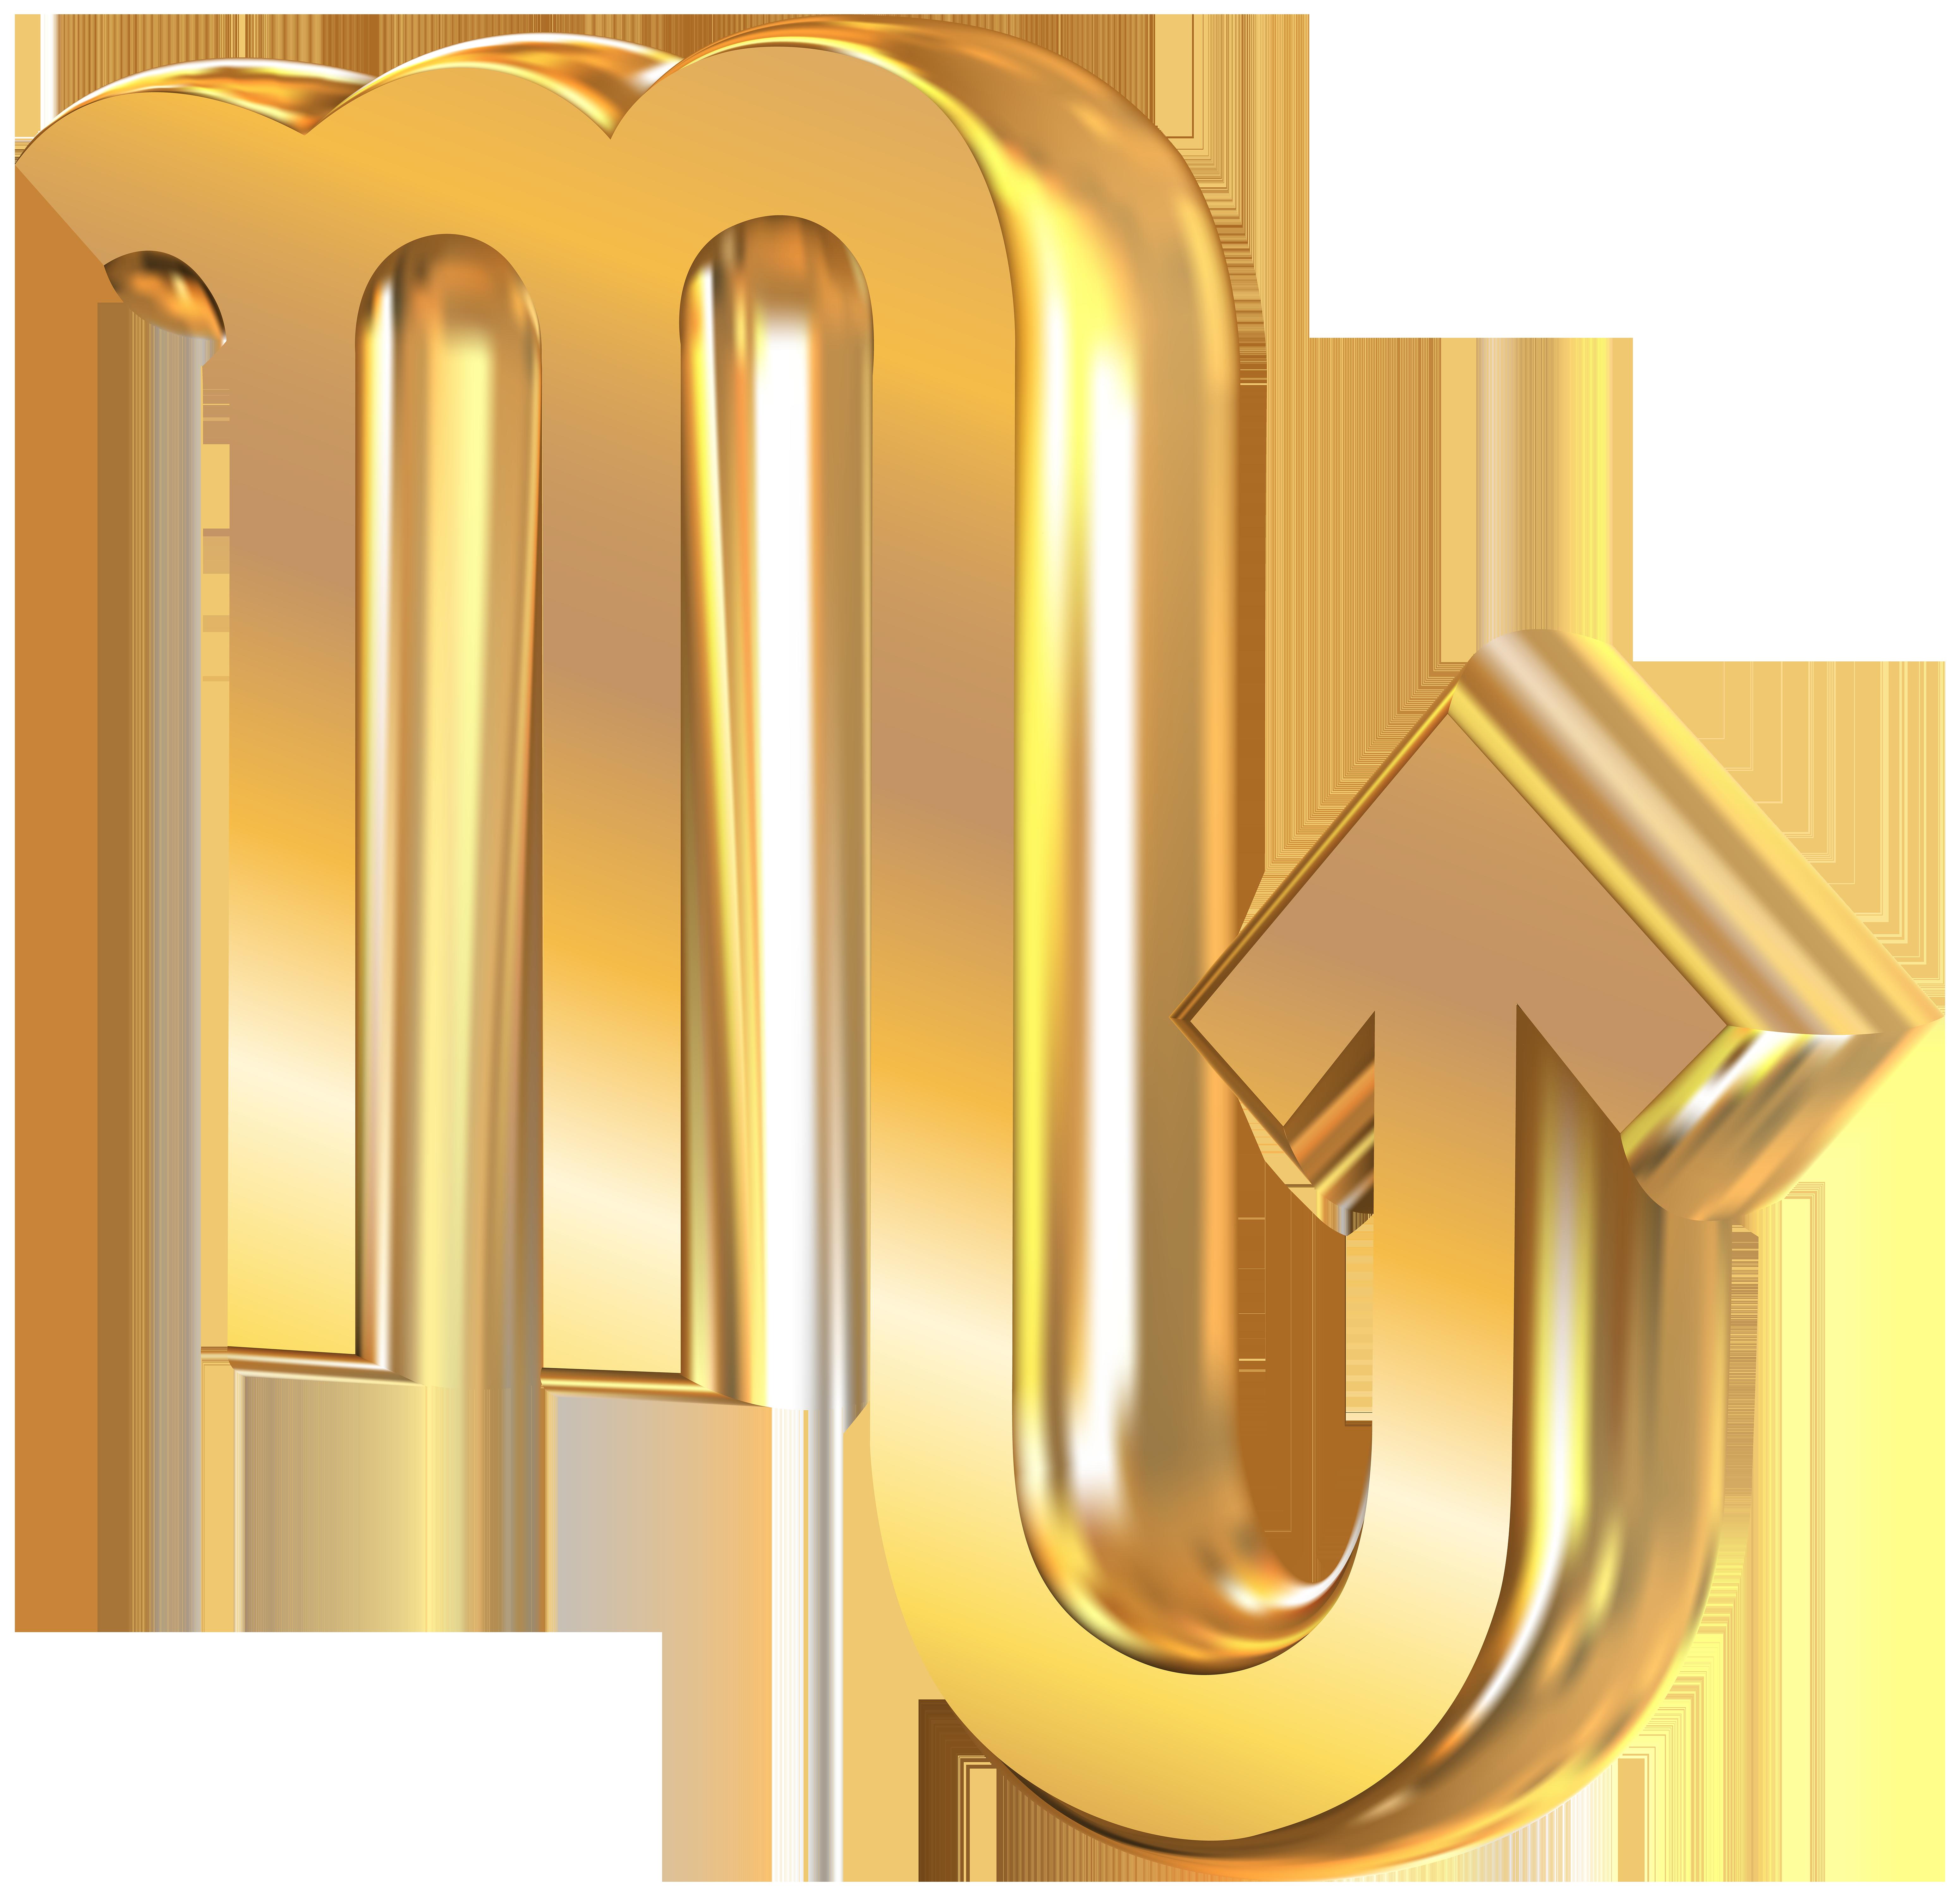 Scorpio 3D Gold Zodiac Sign PNG Clip Art Image.